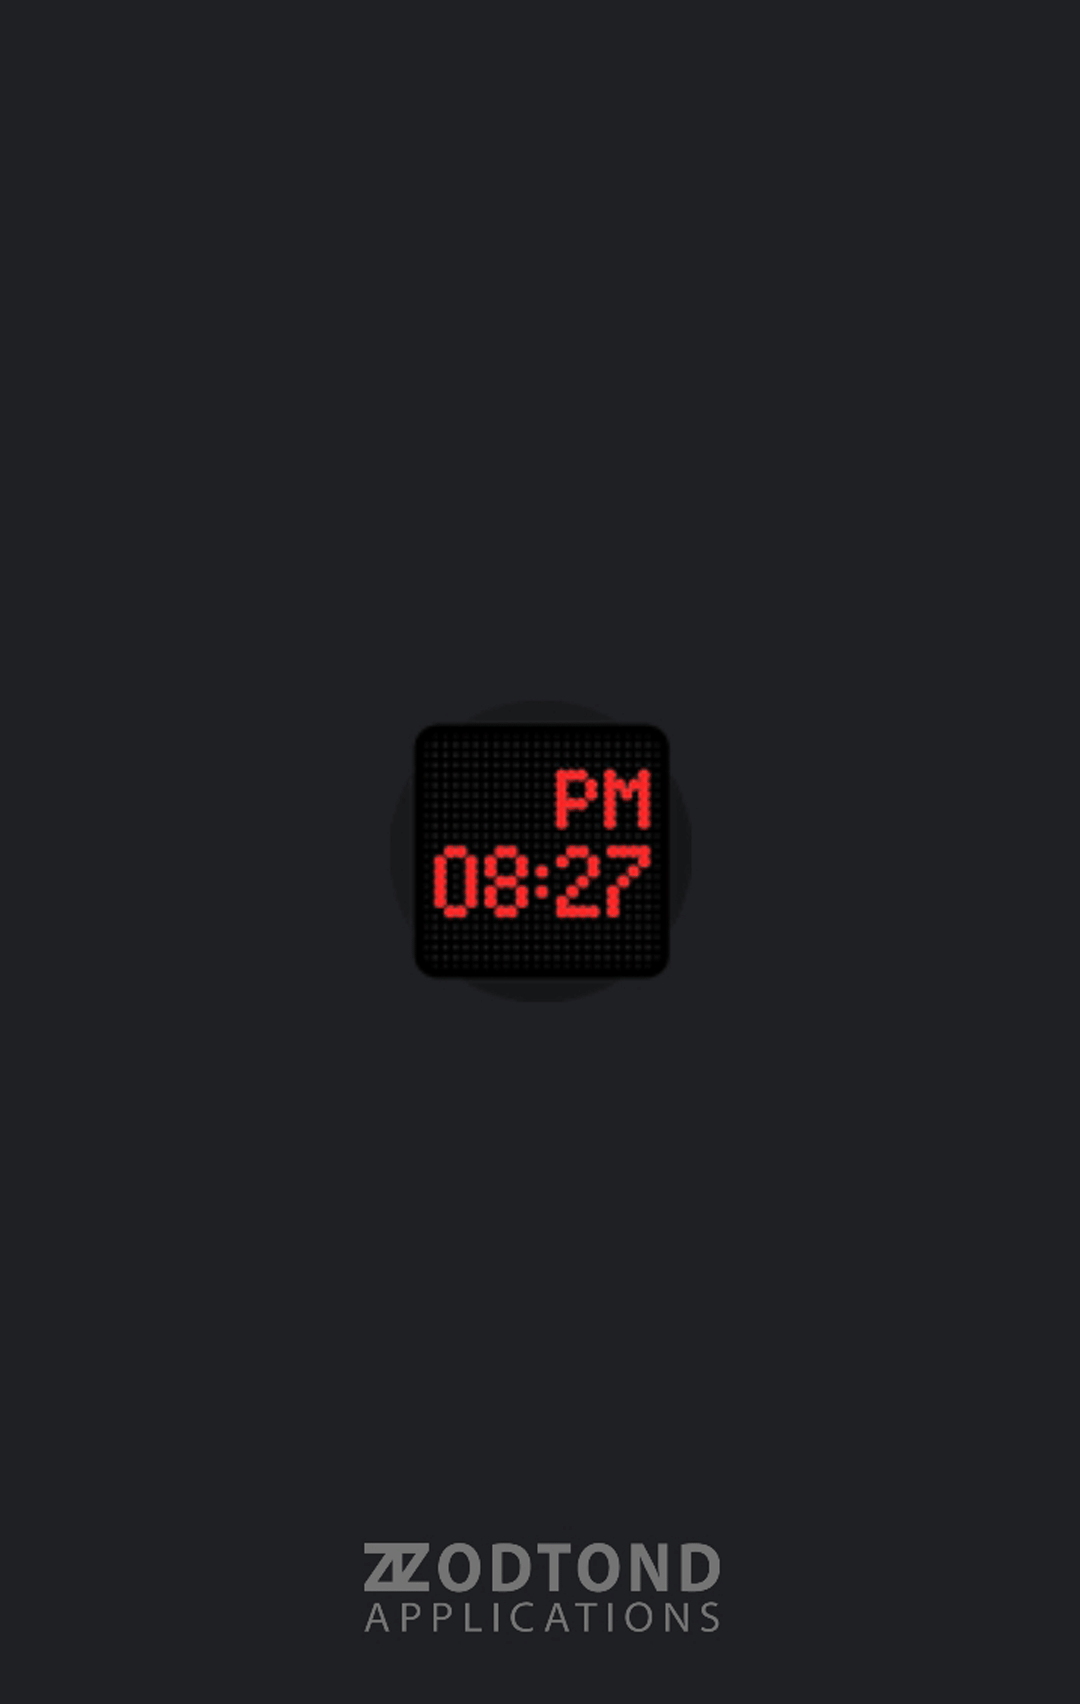 تصویر 1 ساعت دیجیتال